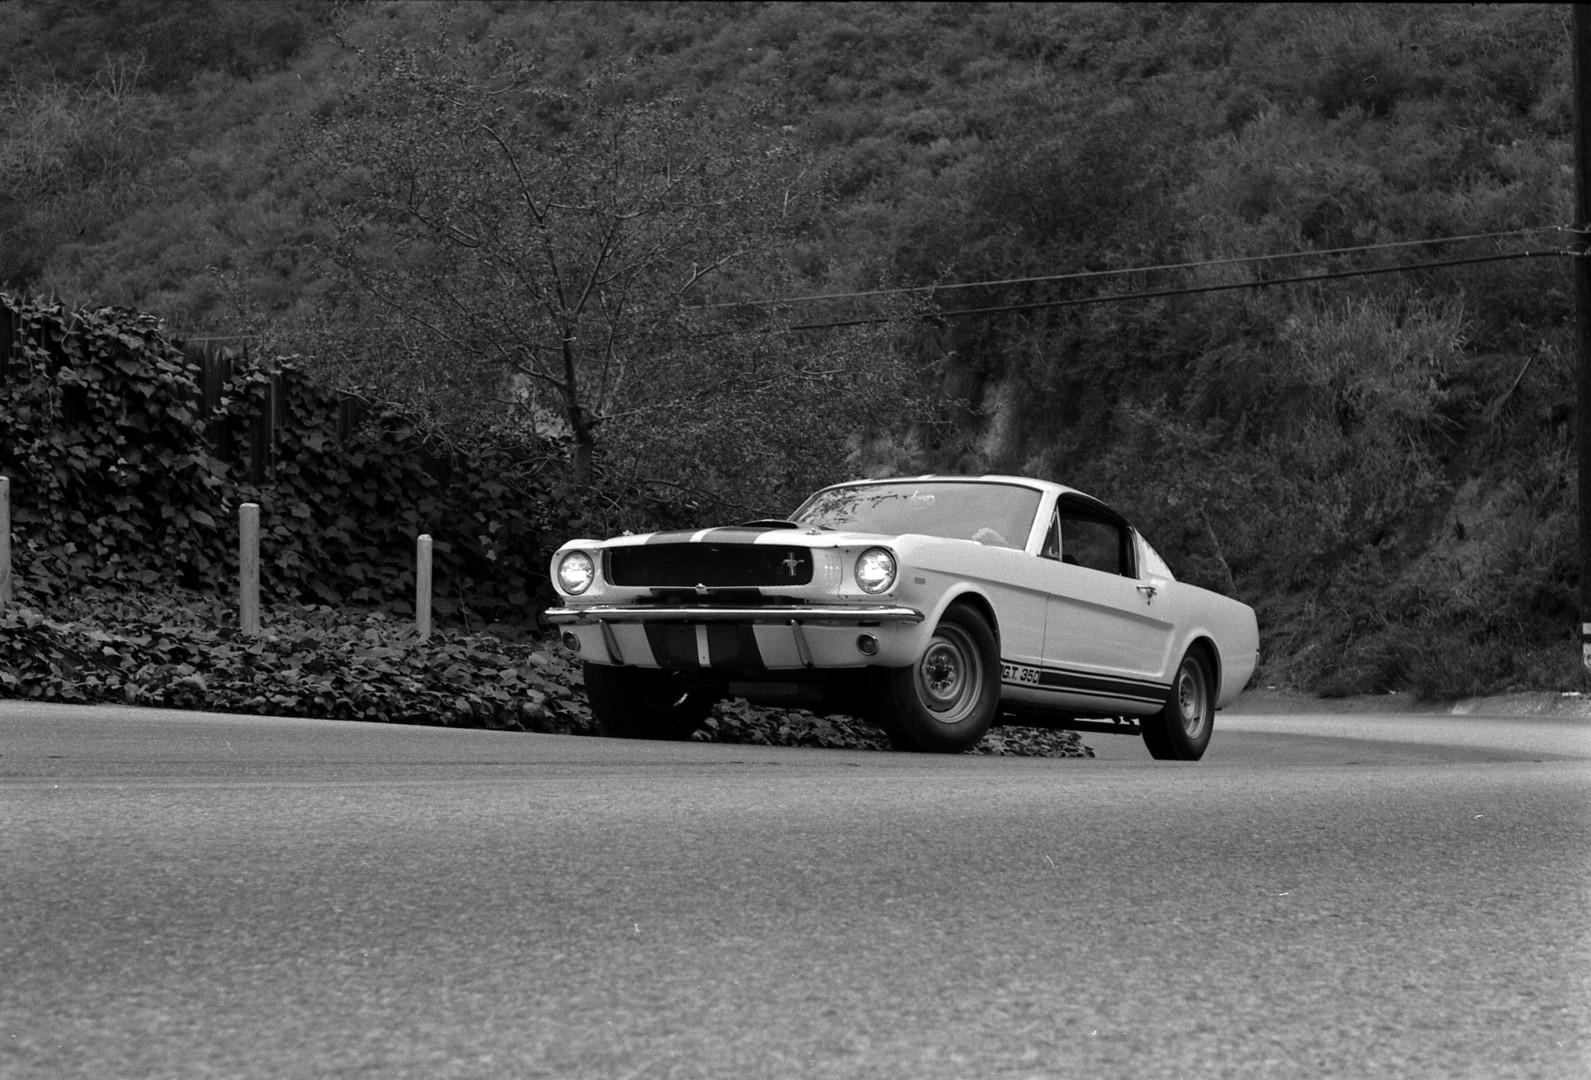 Ford Mustang Wallpaper 1965